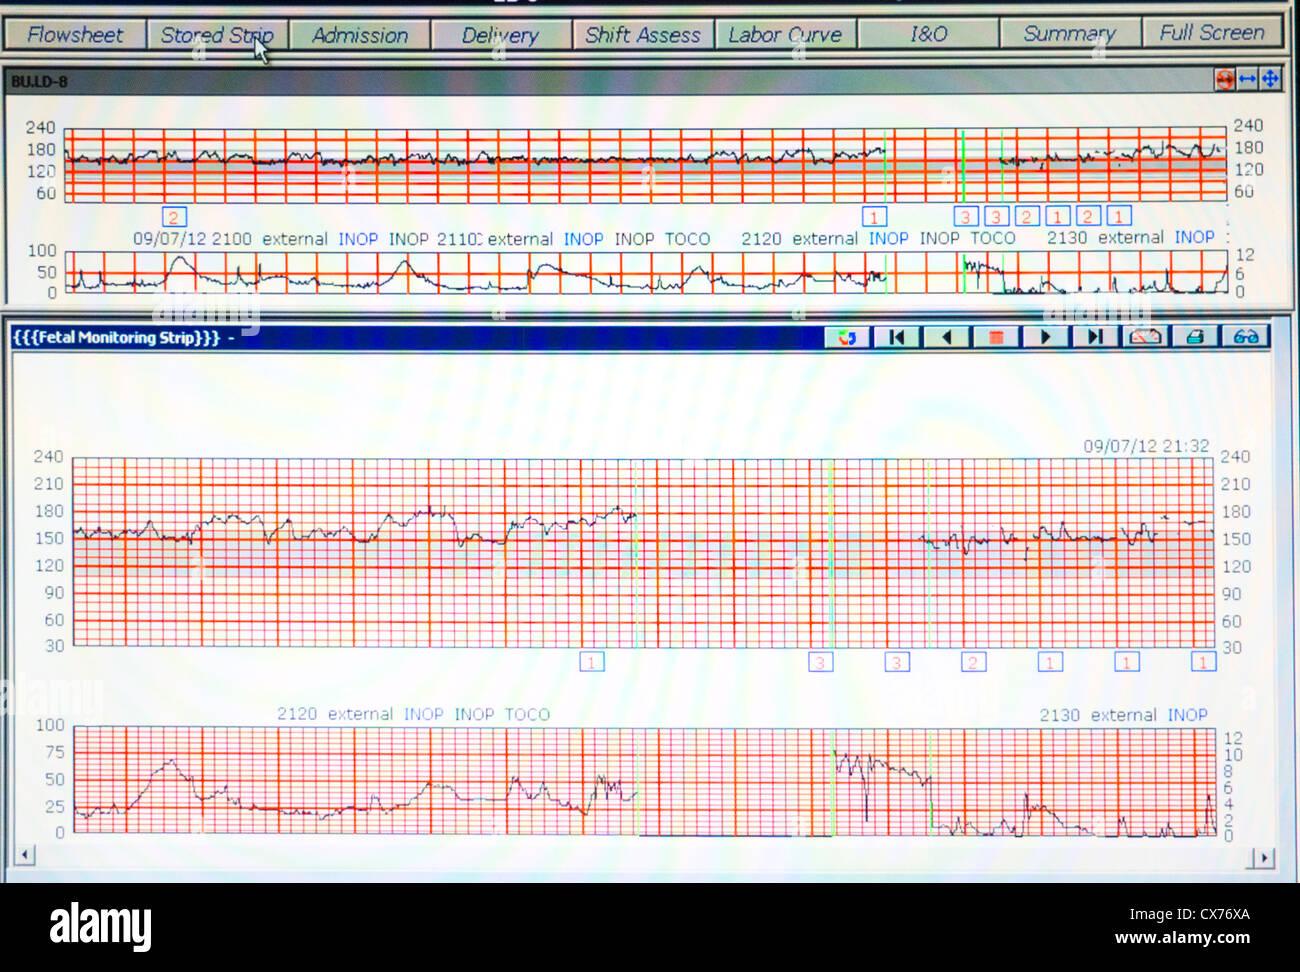 fetal monitoring results - Stock Image